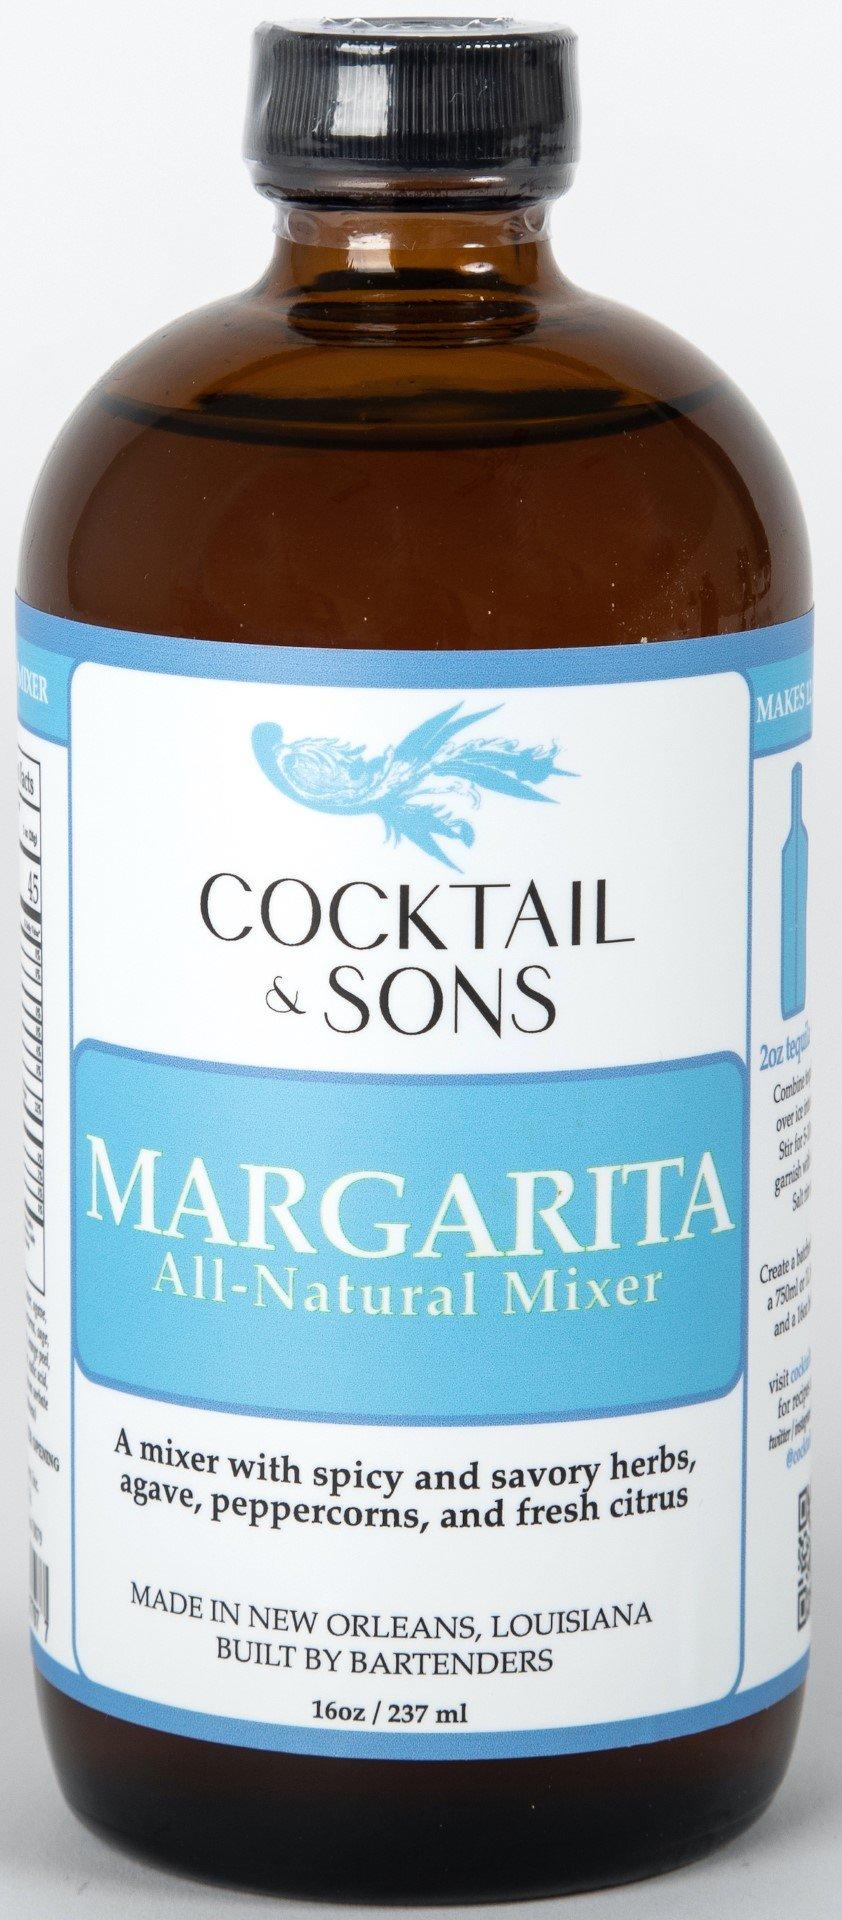 Cocktail & Sons Margarita Mixer